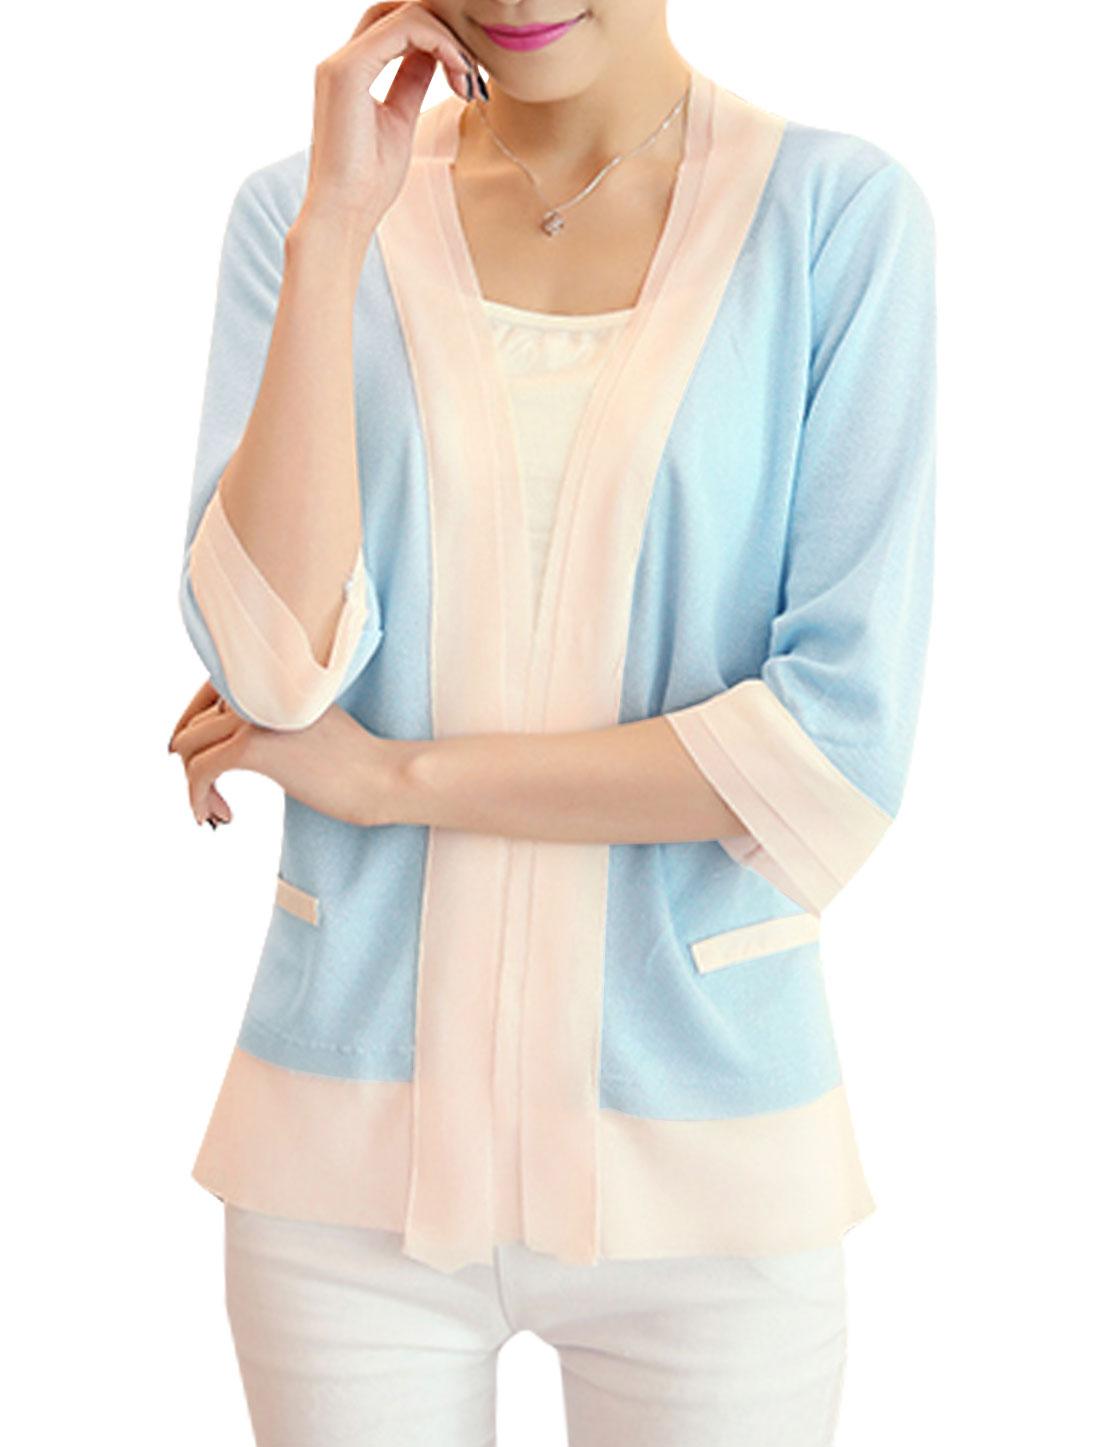 Women Buttonless Panel Design Casual Cardigans Light Blue XS